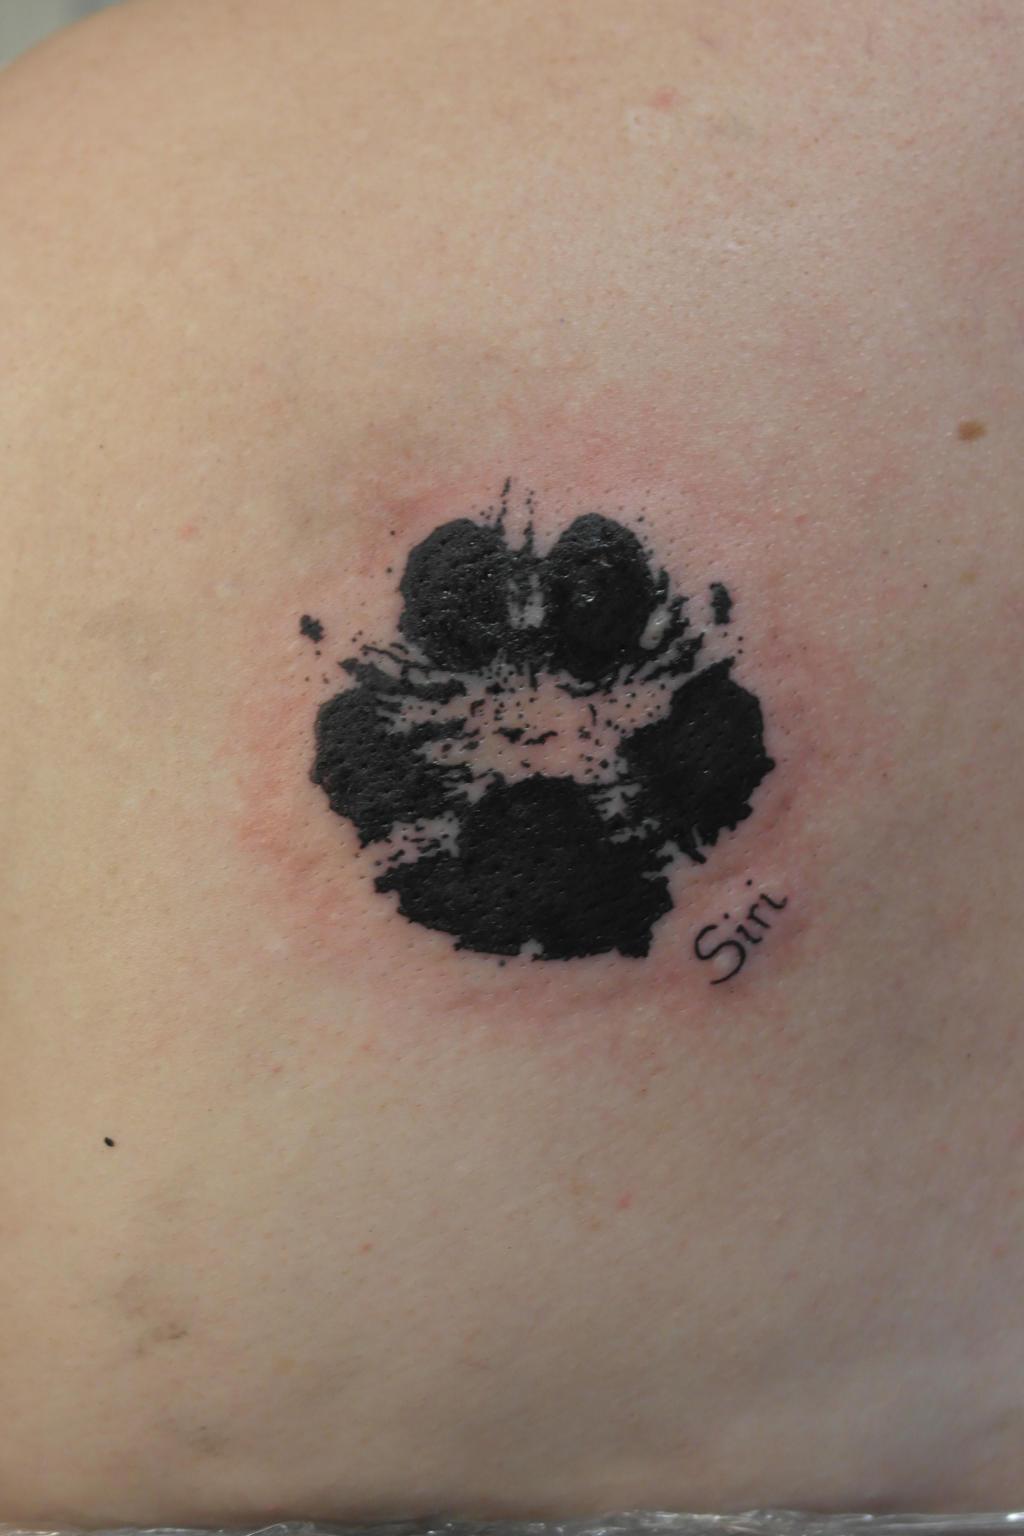 dog paw tattoo by ArthouseGrafika on DeviantArt